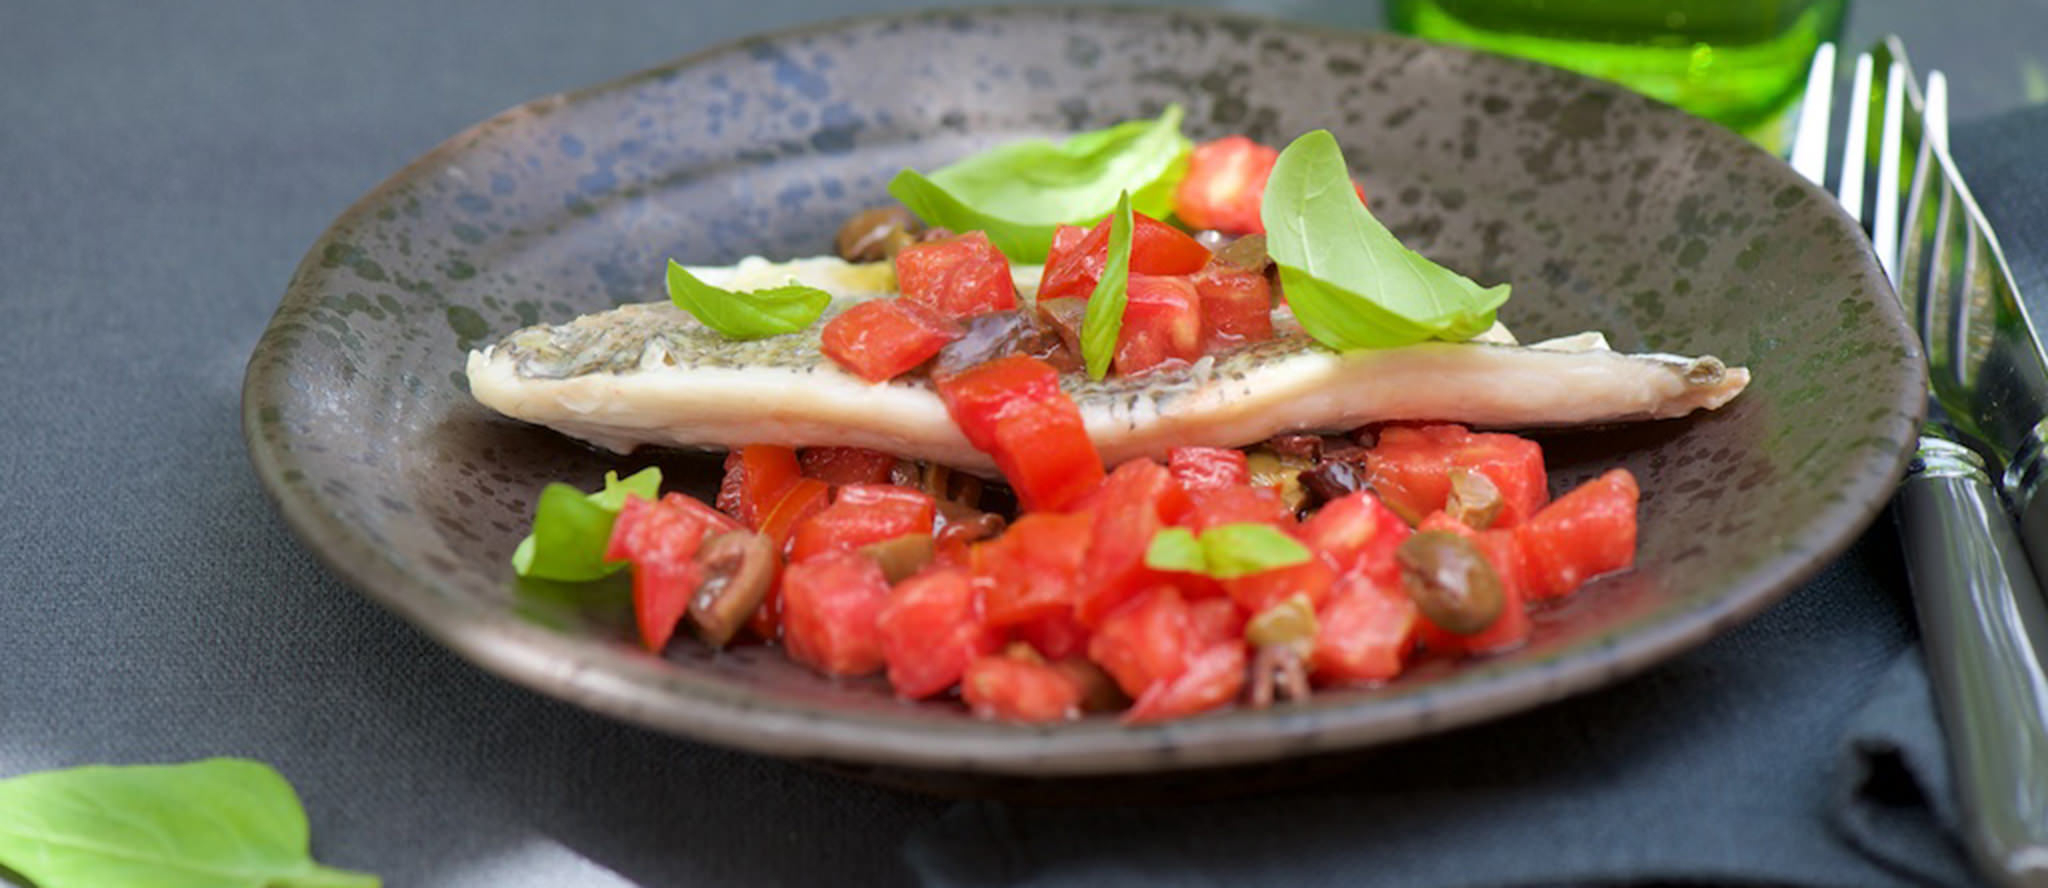 Dorade royale tomate bandeau